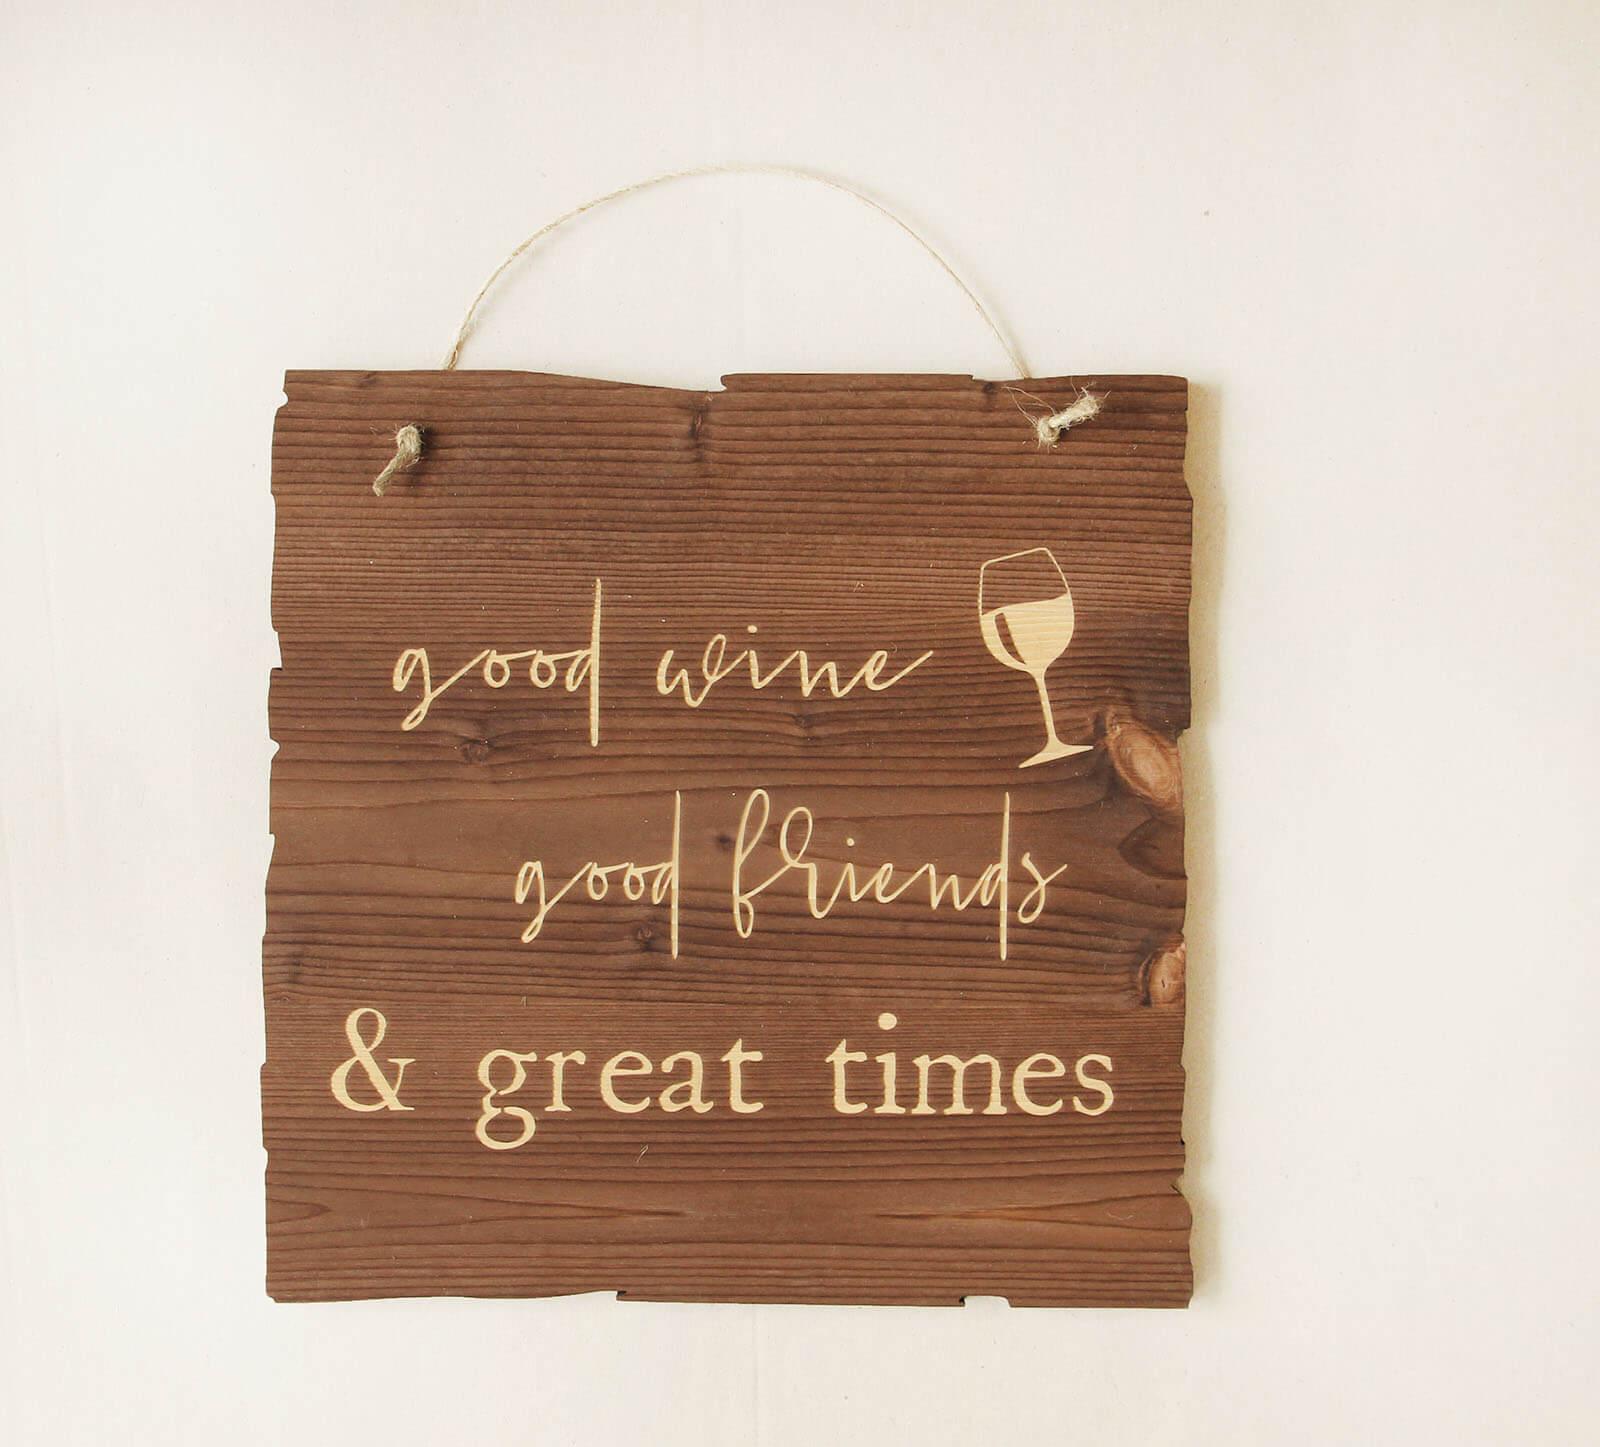 Wandbild good wine & friends